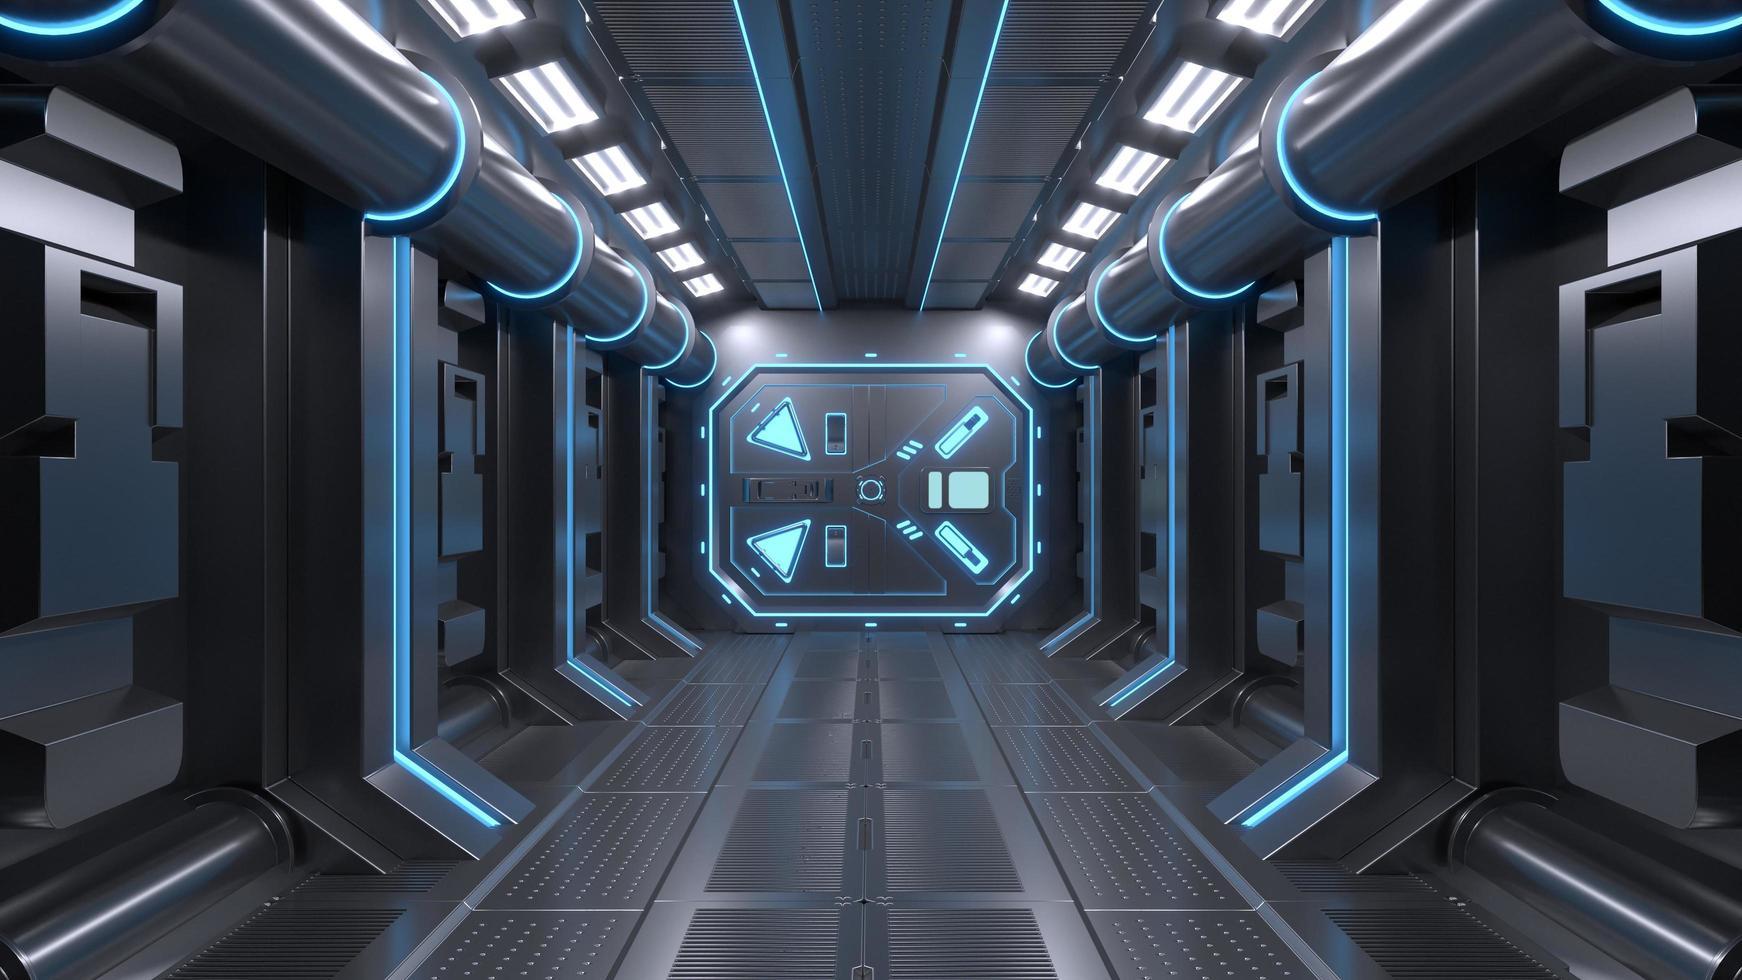 Science background fiction interior room sci-fi spaceship corridors blue photo